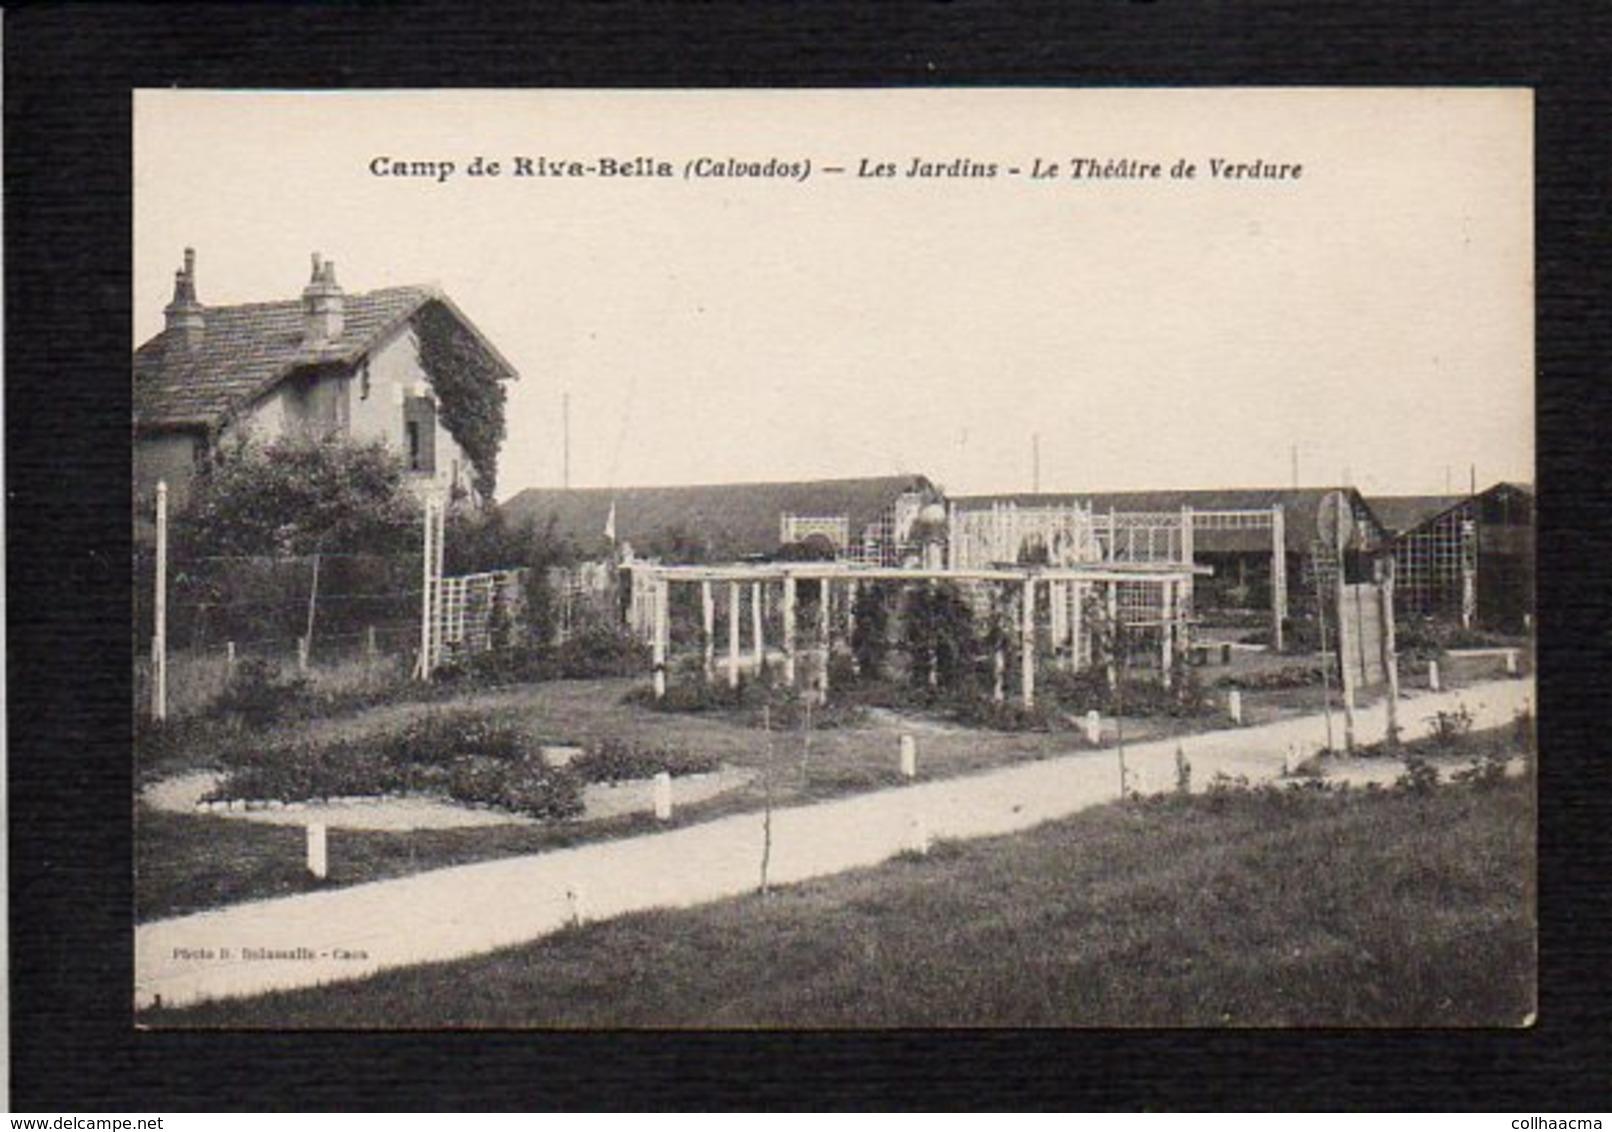 14 Ouistreham Riva Bella / Camp De Riva Bella / Les Jardins / Thèâtre De Verdure - Ouistreham